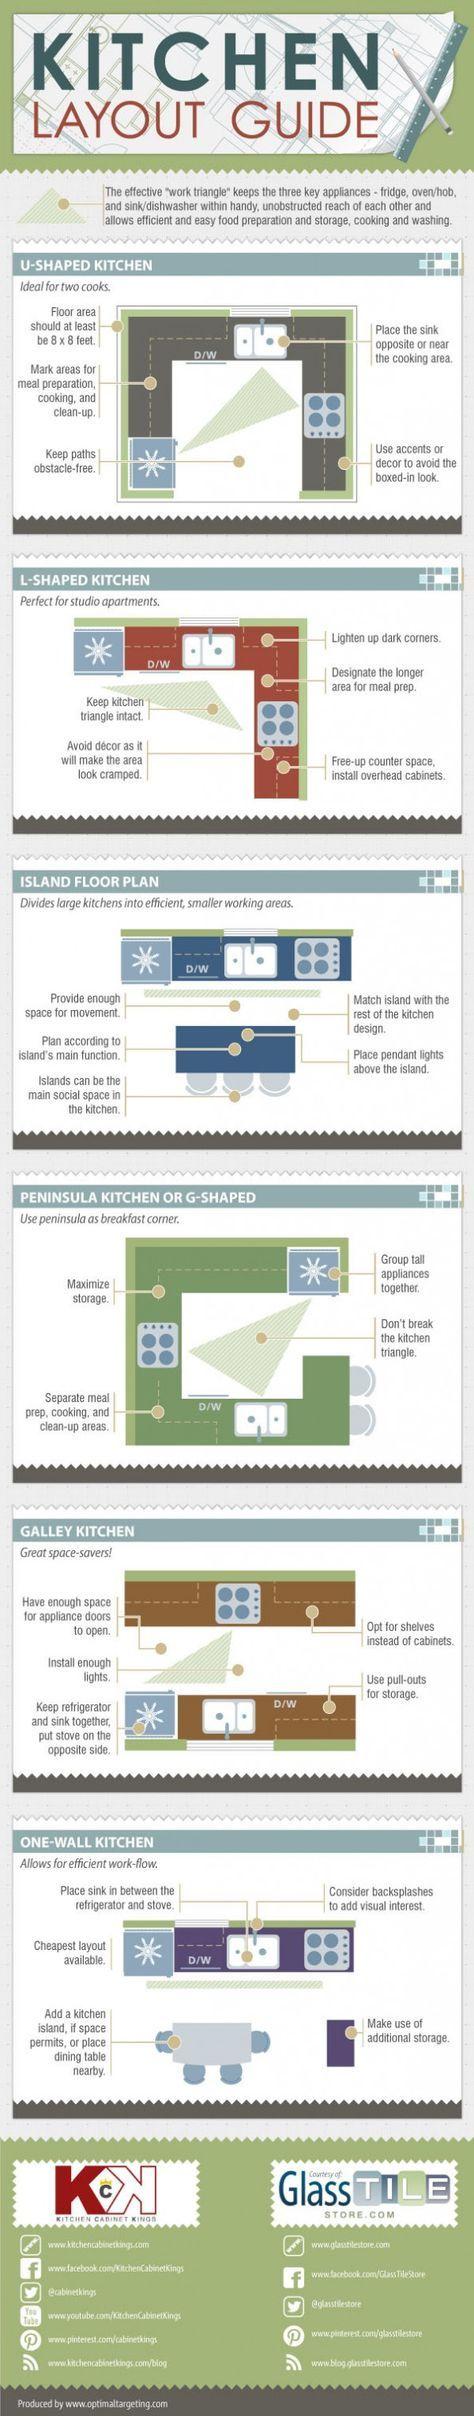 Kitchen Design Questionnaire Alluring 25 Ide Terbaik Küche Gestalten Nach Feng Shui Di Pinterest  Home Decorating Design